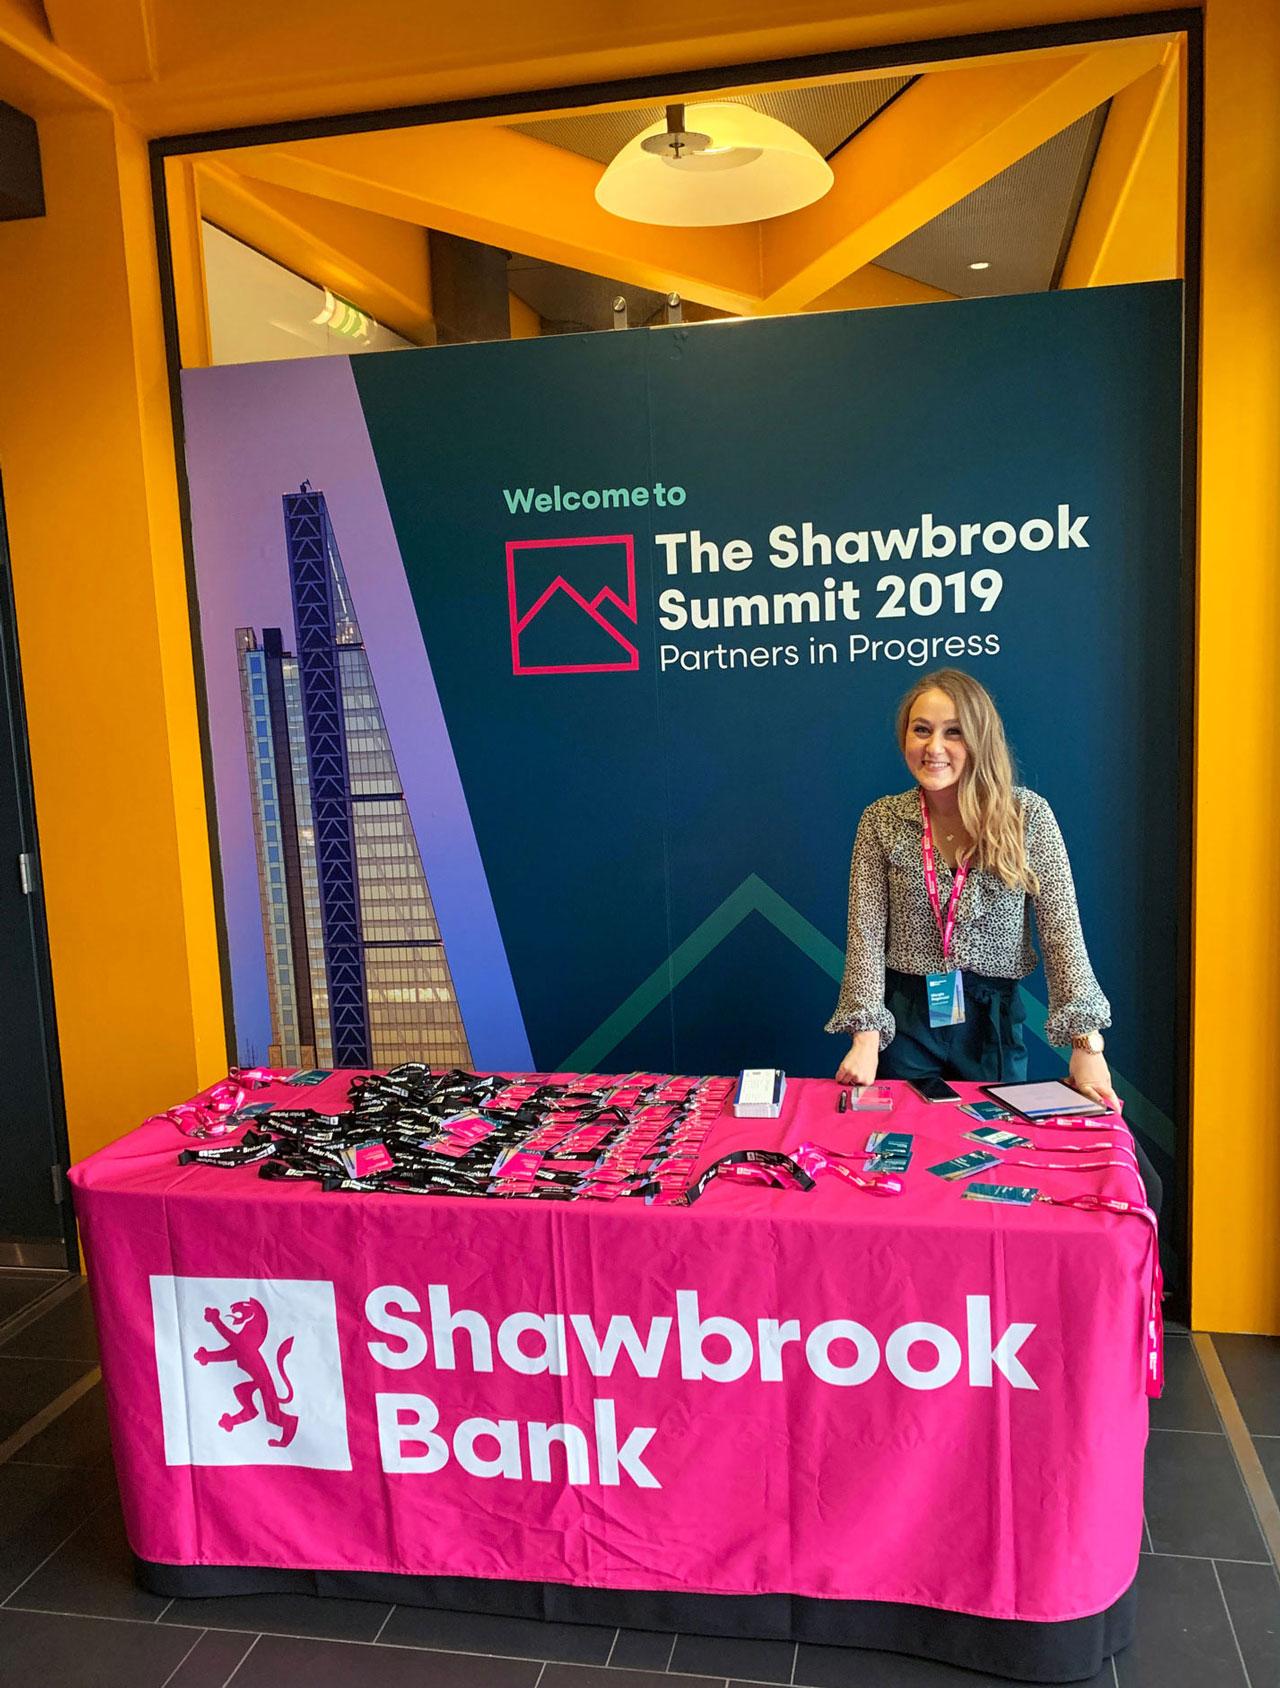 Glendale Shawbrook Broker Summit Welcome Stand